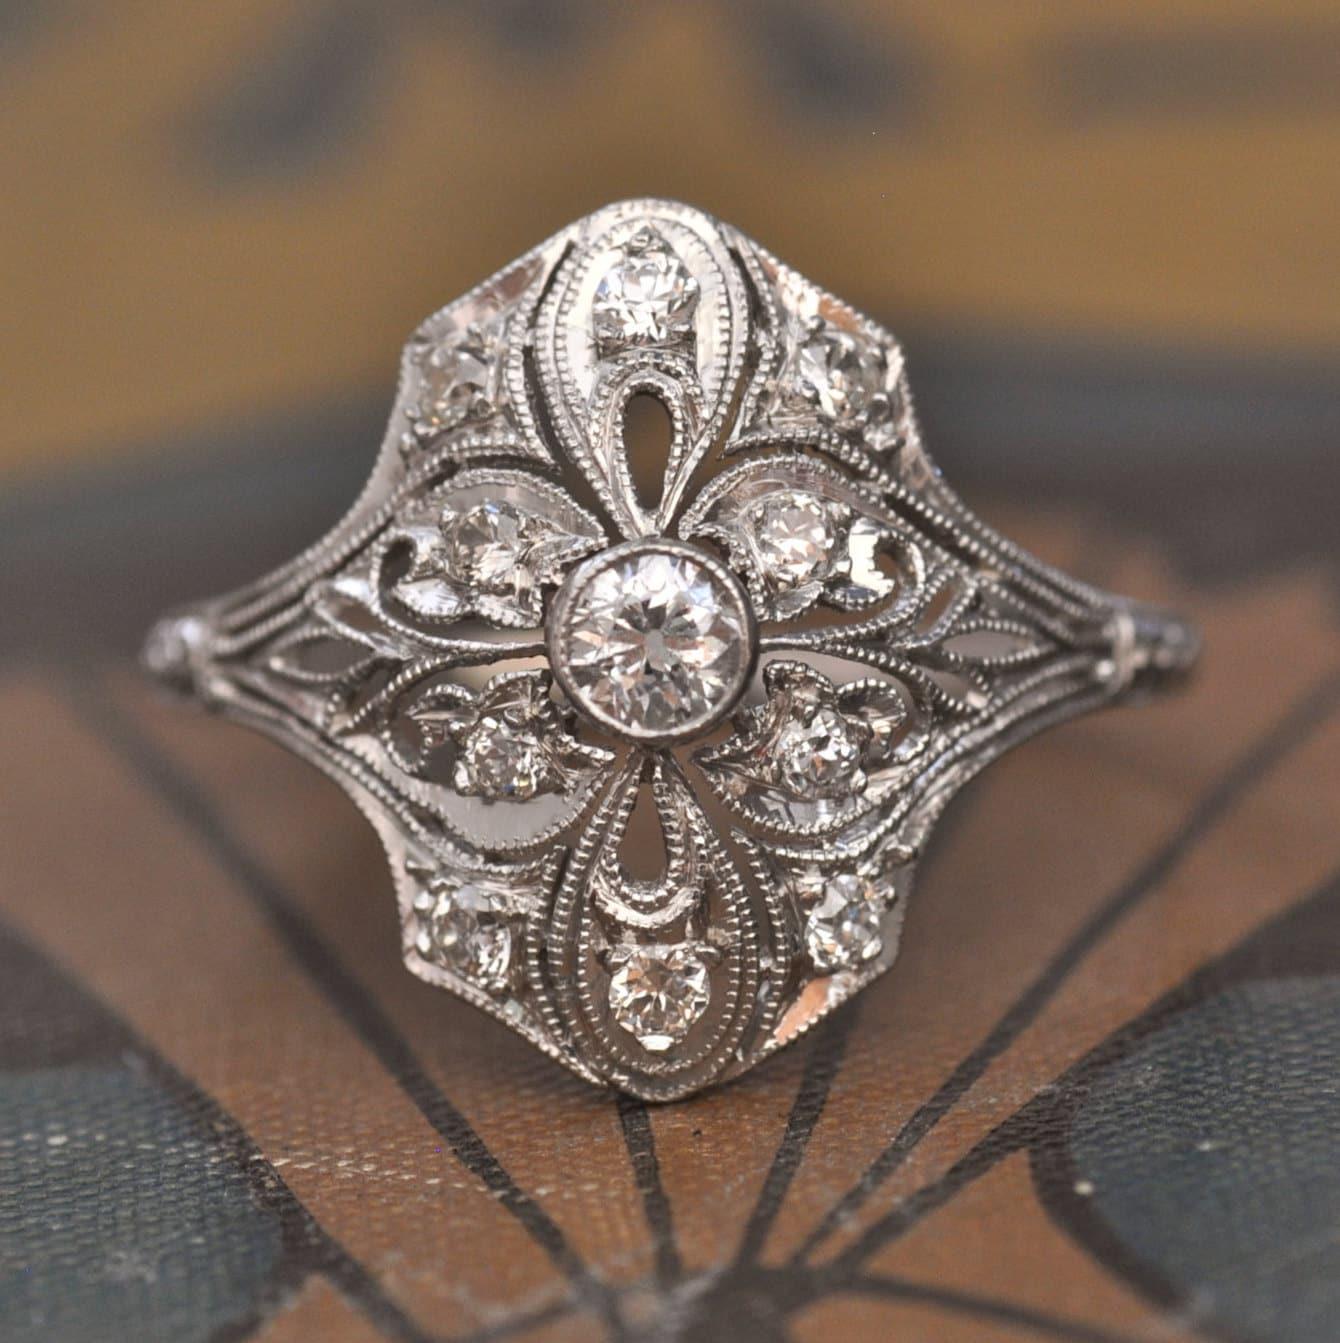 engagement ring 1920s engagement ring art deco engagement. Black Bedroom Furniture Sets. Home Design Ideas